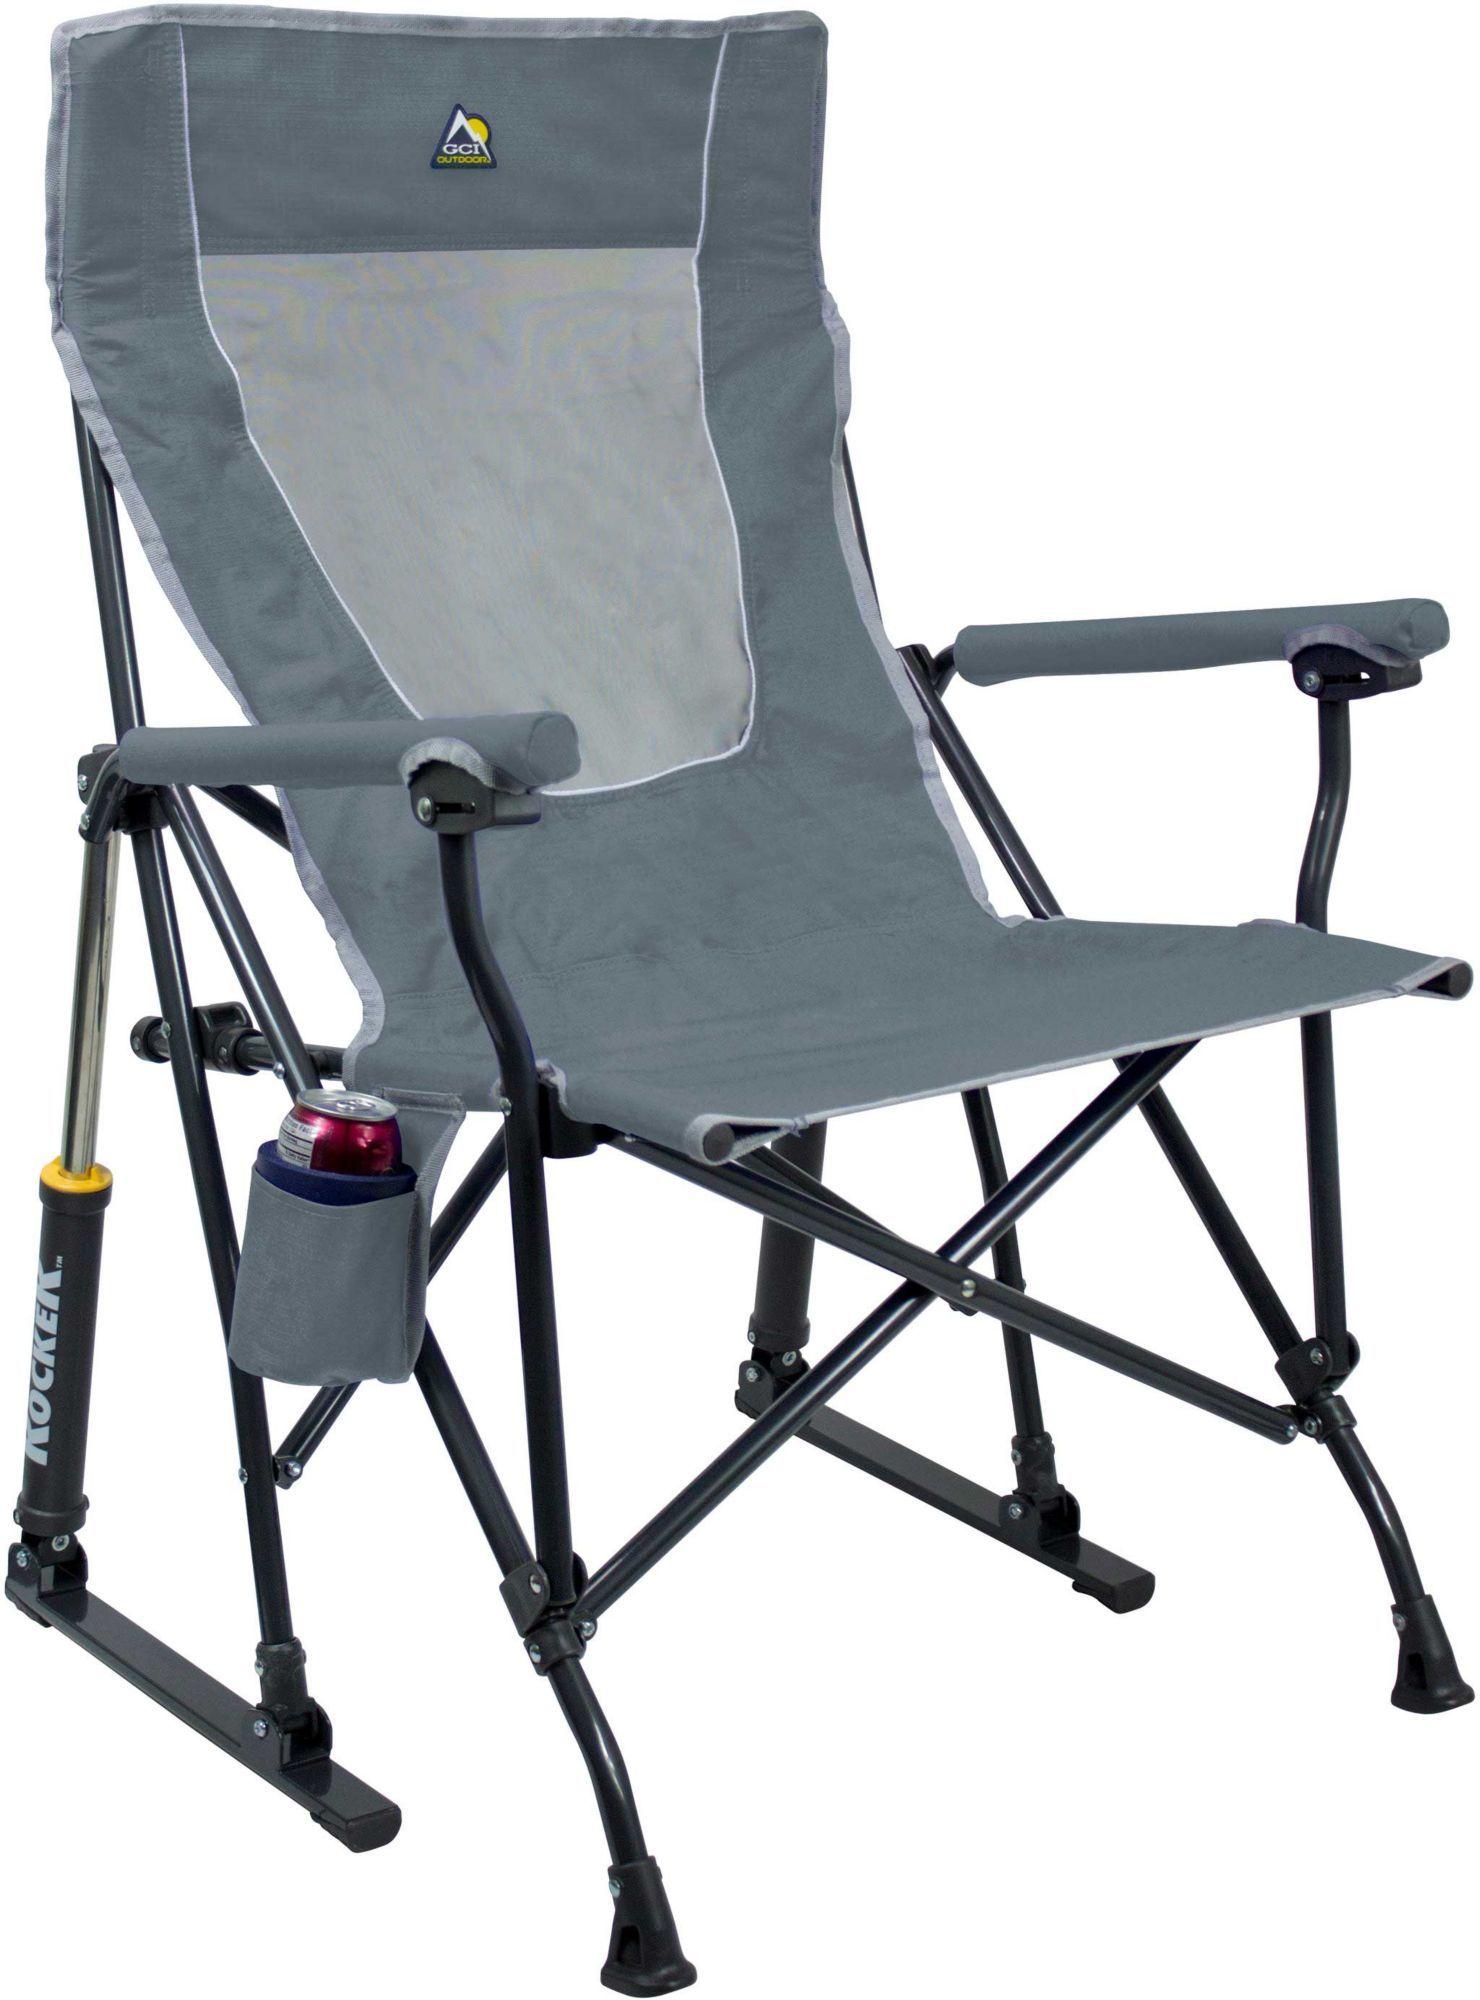 GCI Outdoor RoadTrip Rocker Chair Patio furniture sets